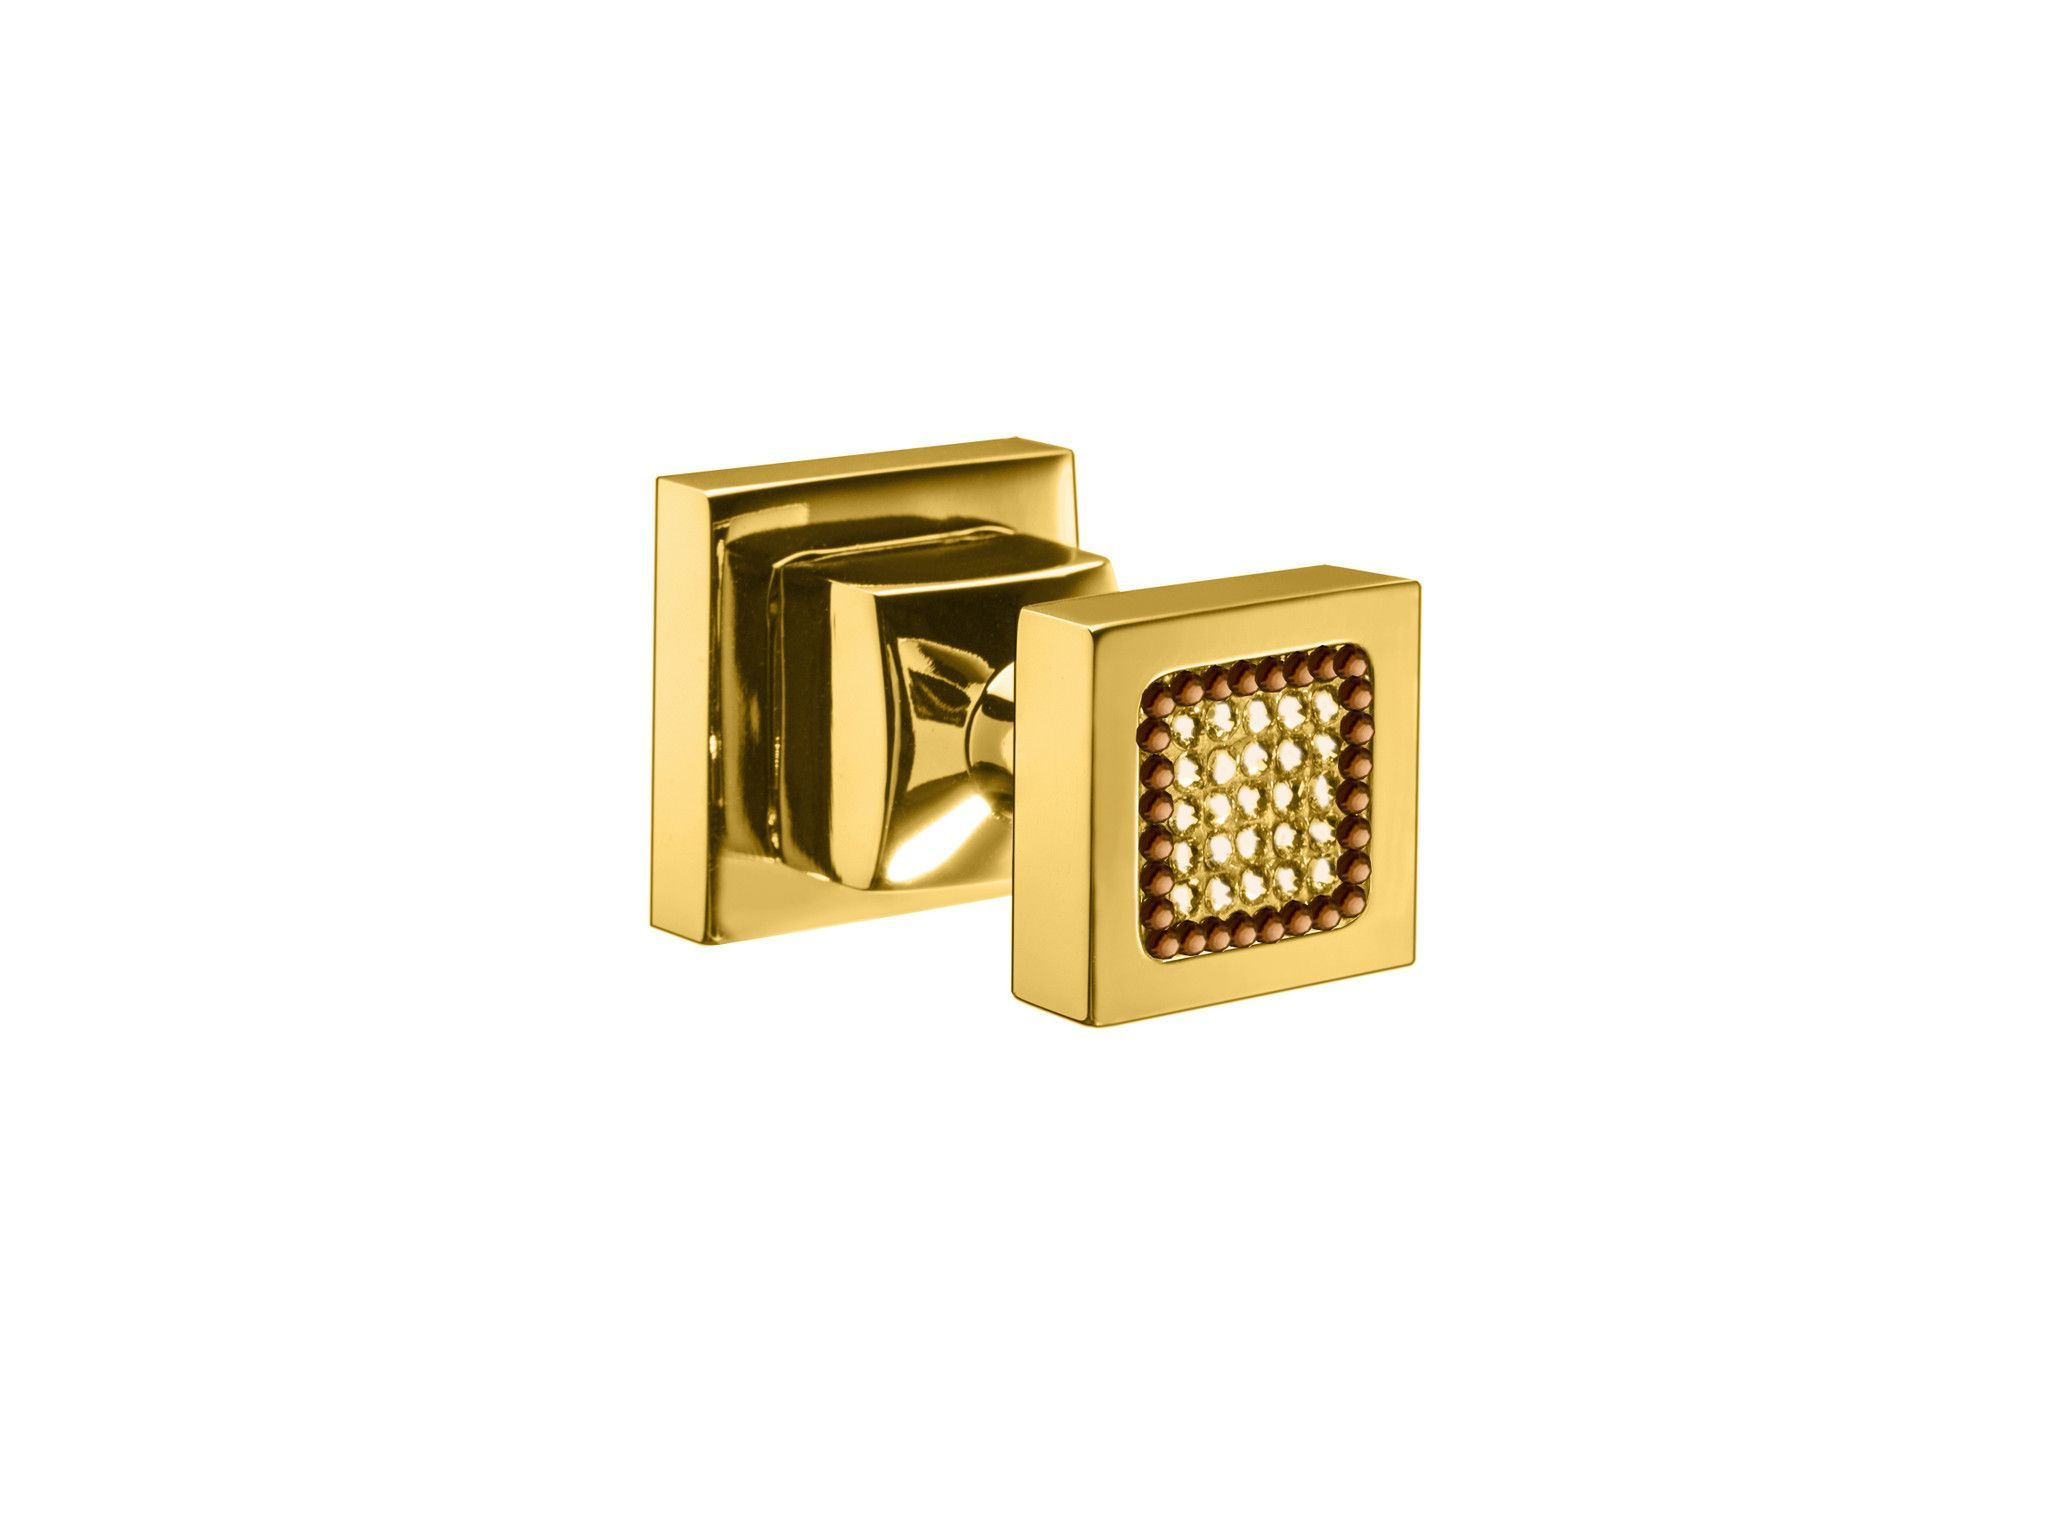 Starlight Brass Towel Robe Hook/ Hanger w/ Swarovski Crystals - Gold/ Chrome